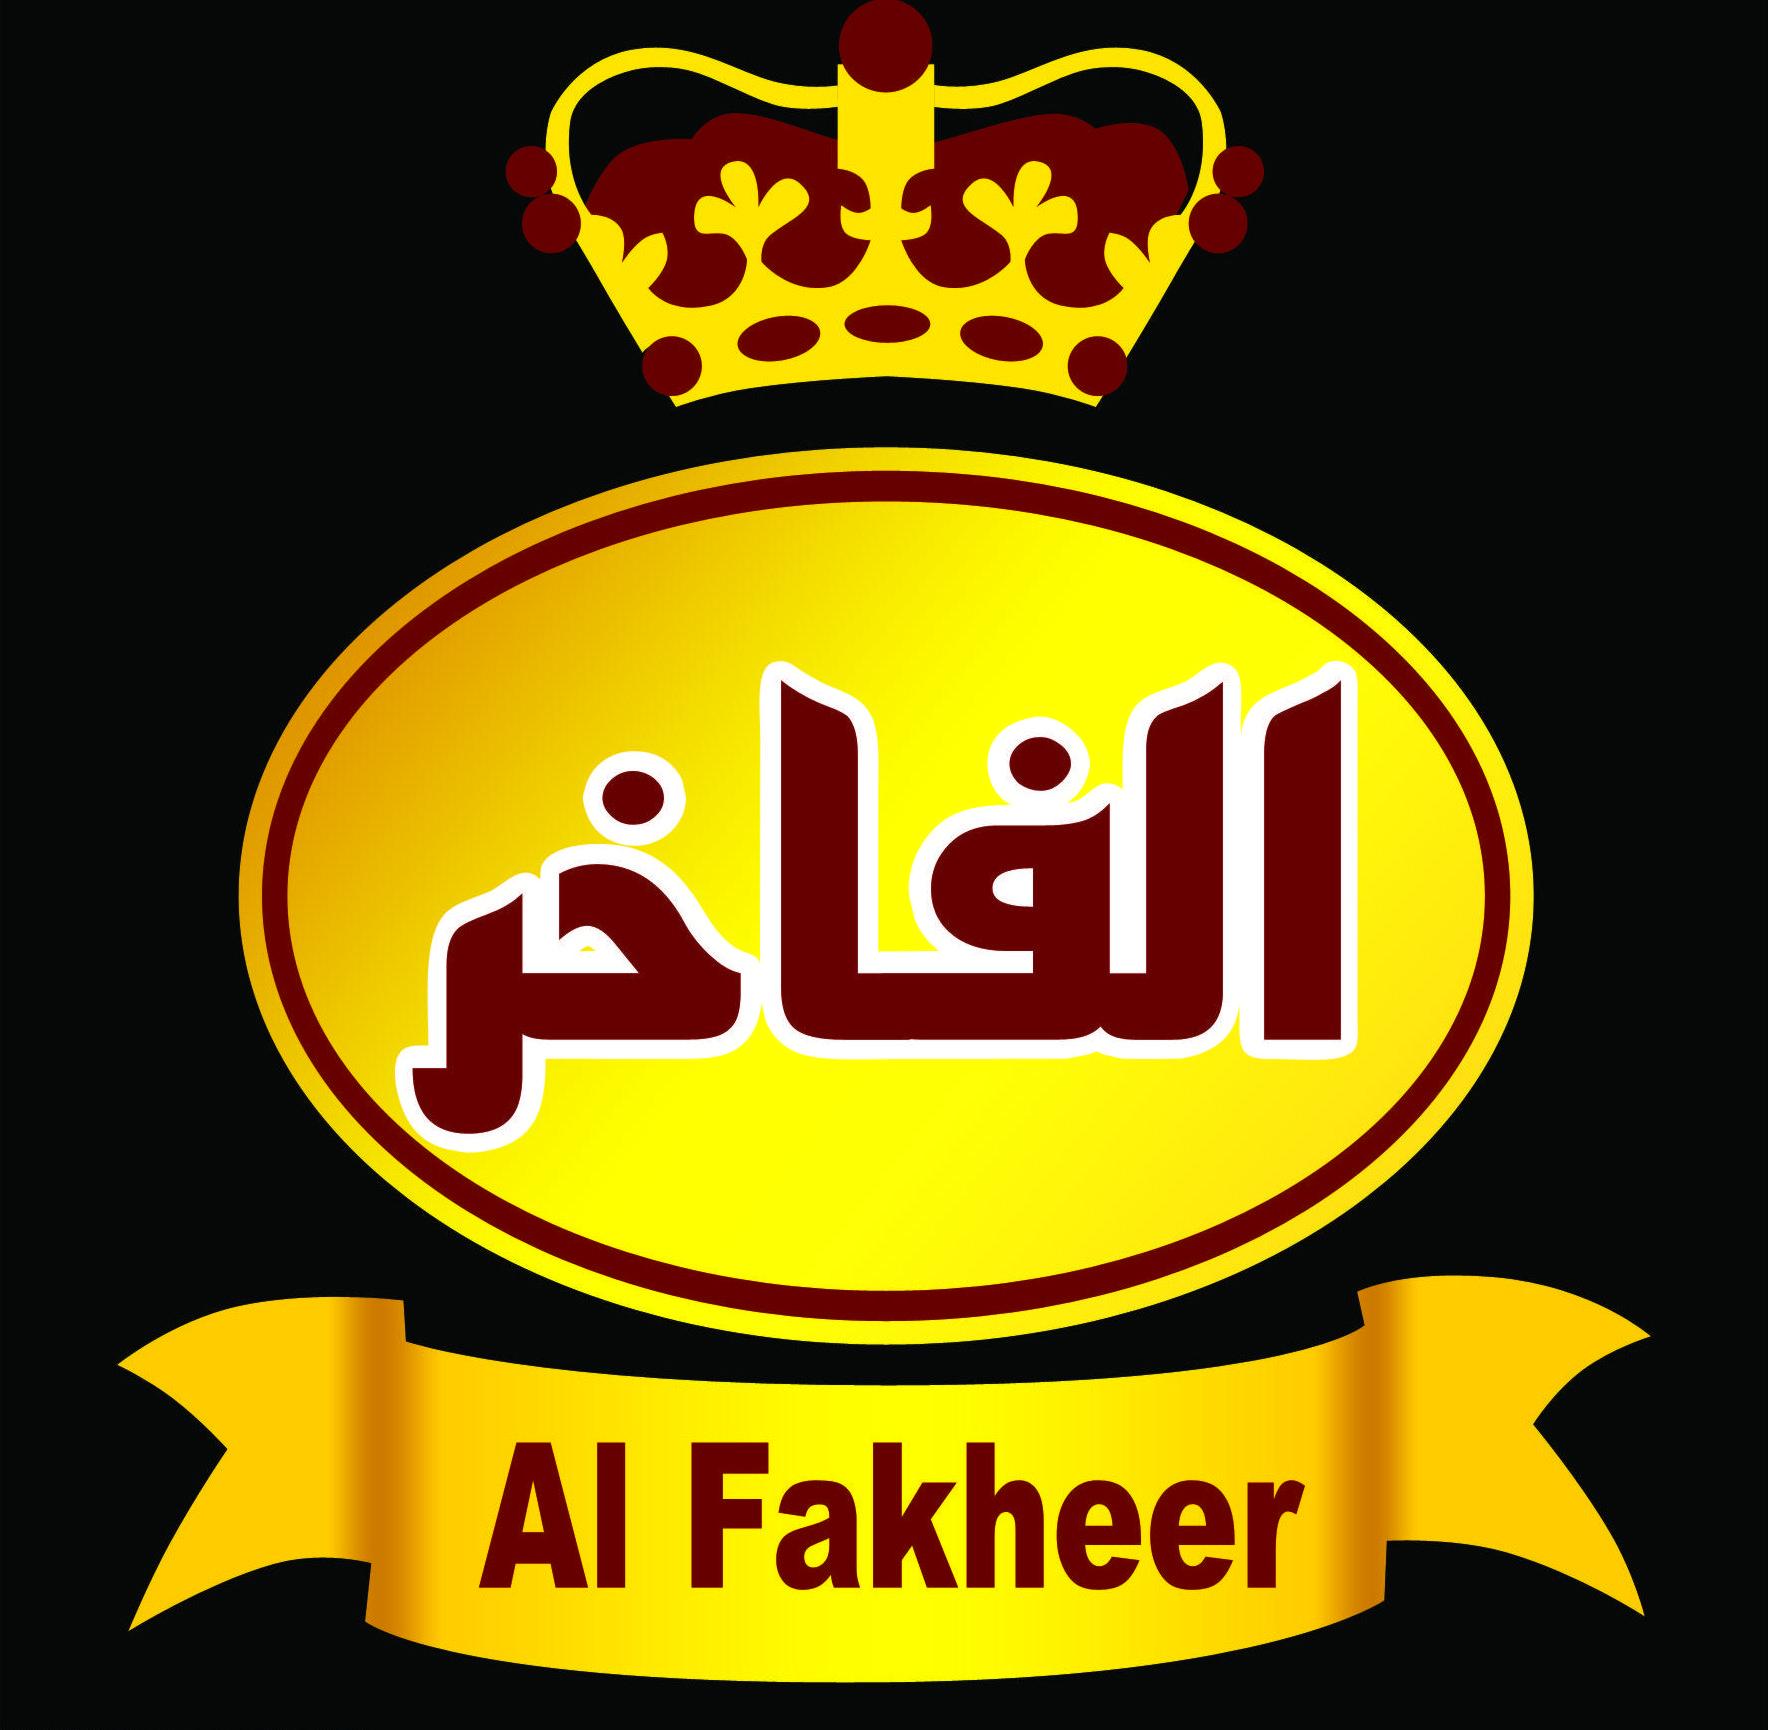 Al Fakher логотип бренда